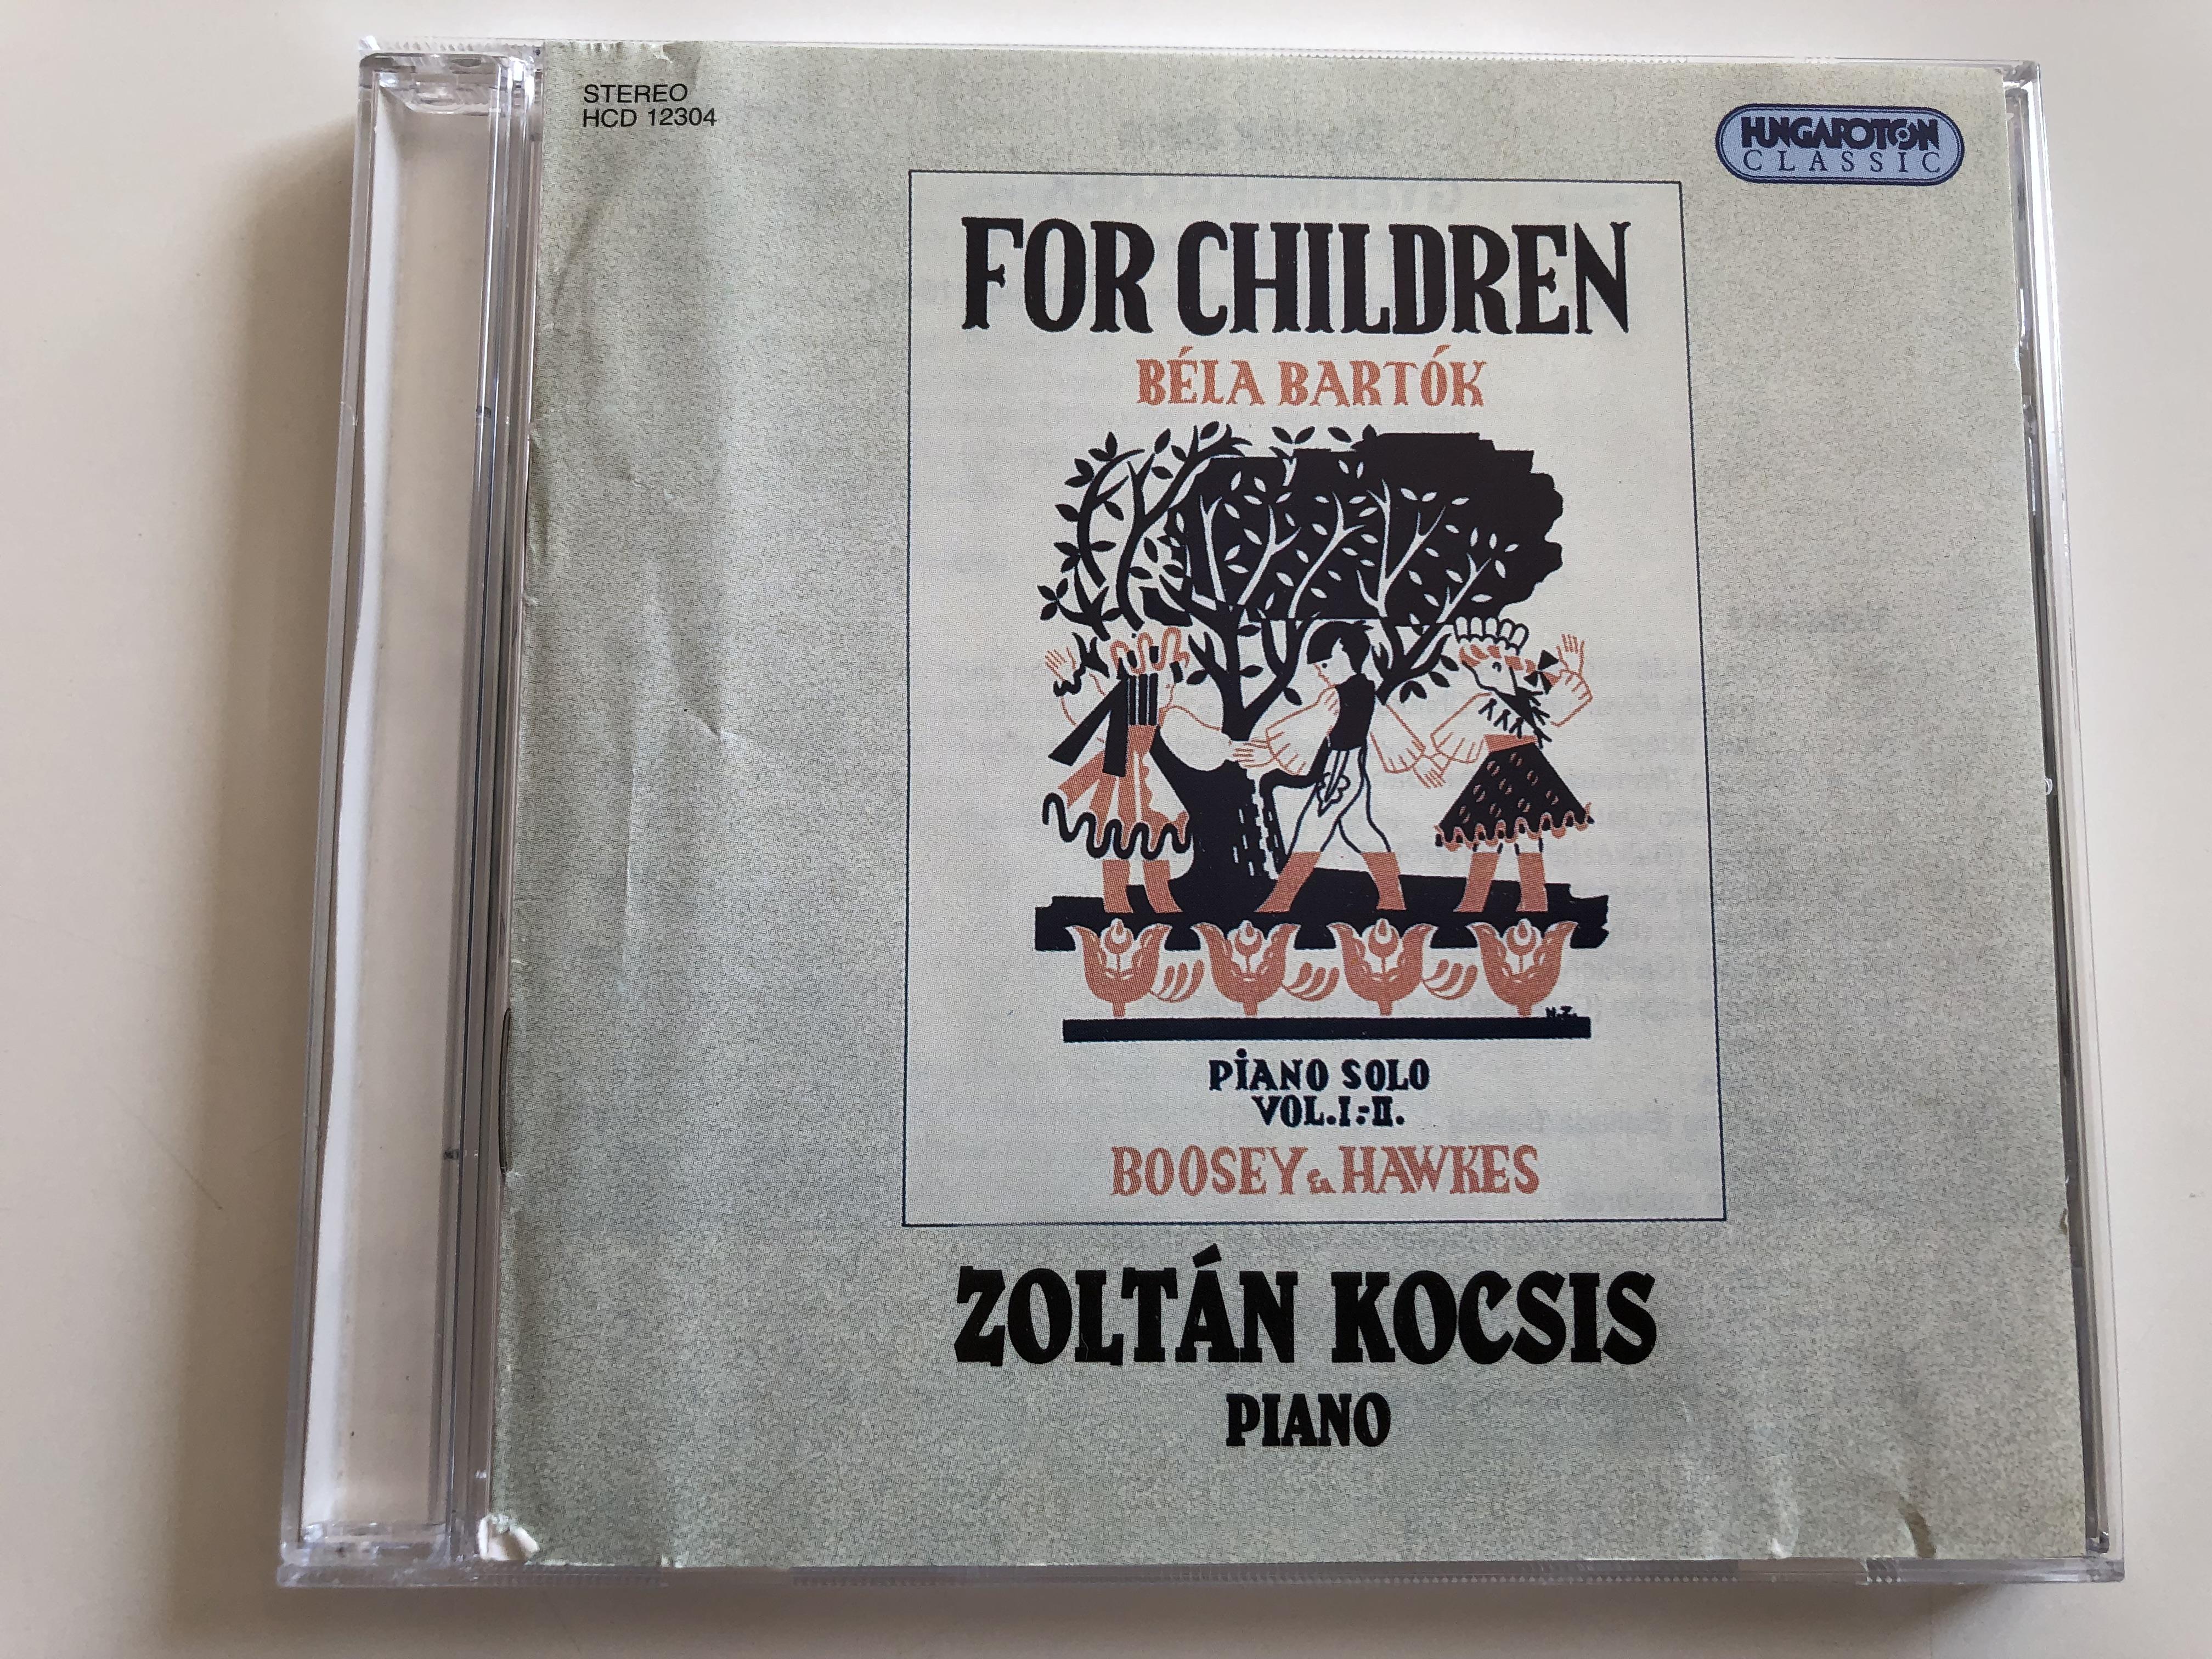 b-la-bart-k-for-children-piano-solo-vol-i-ii.-zolt-n-kocsis-piano-hungaroton-classic-audio-cd-1994-hcd-12304-boosey-hawkes-2-.jpg